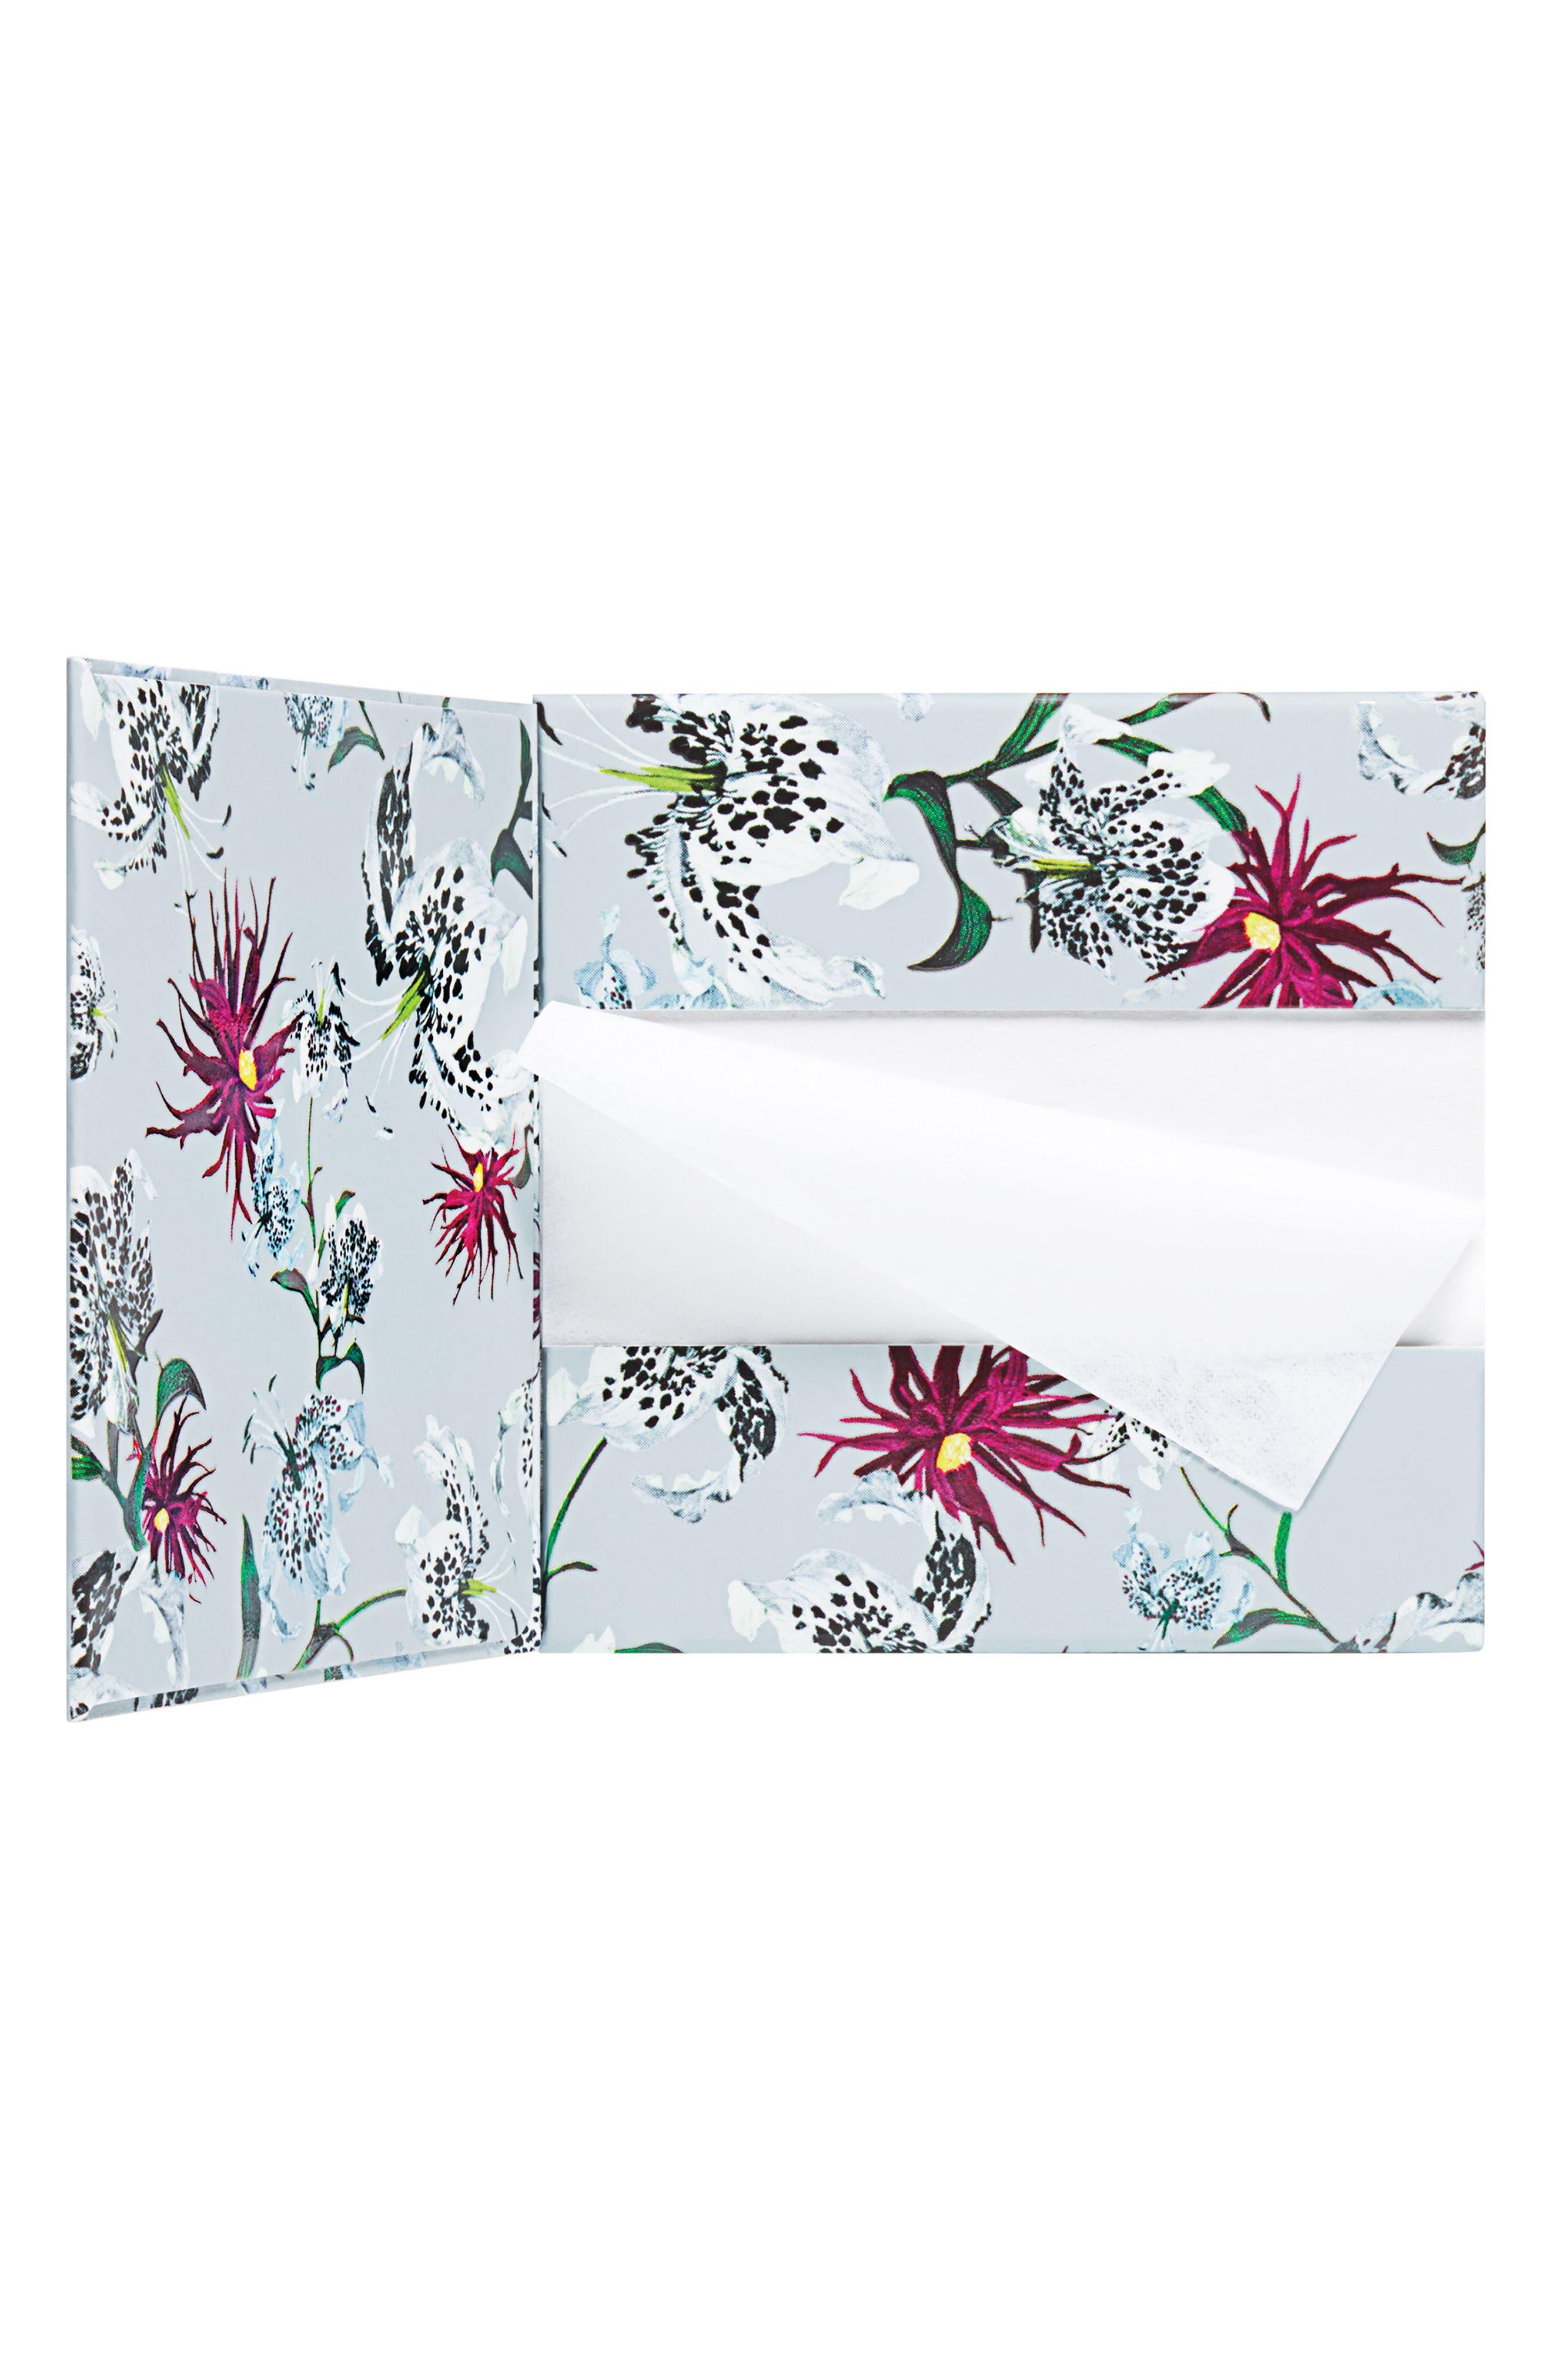 x Erdem Strange Flowers Mattifying Blotting Papers,                         Main,                         color, 000